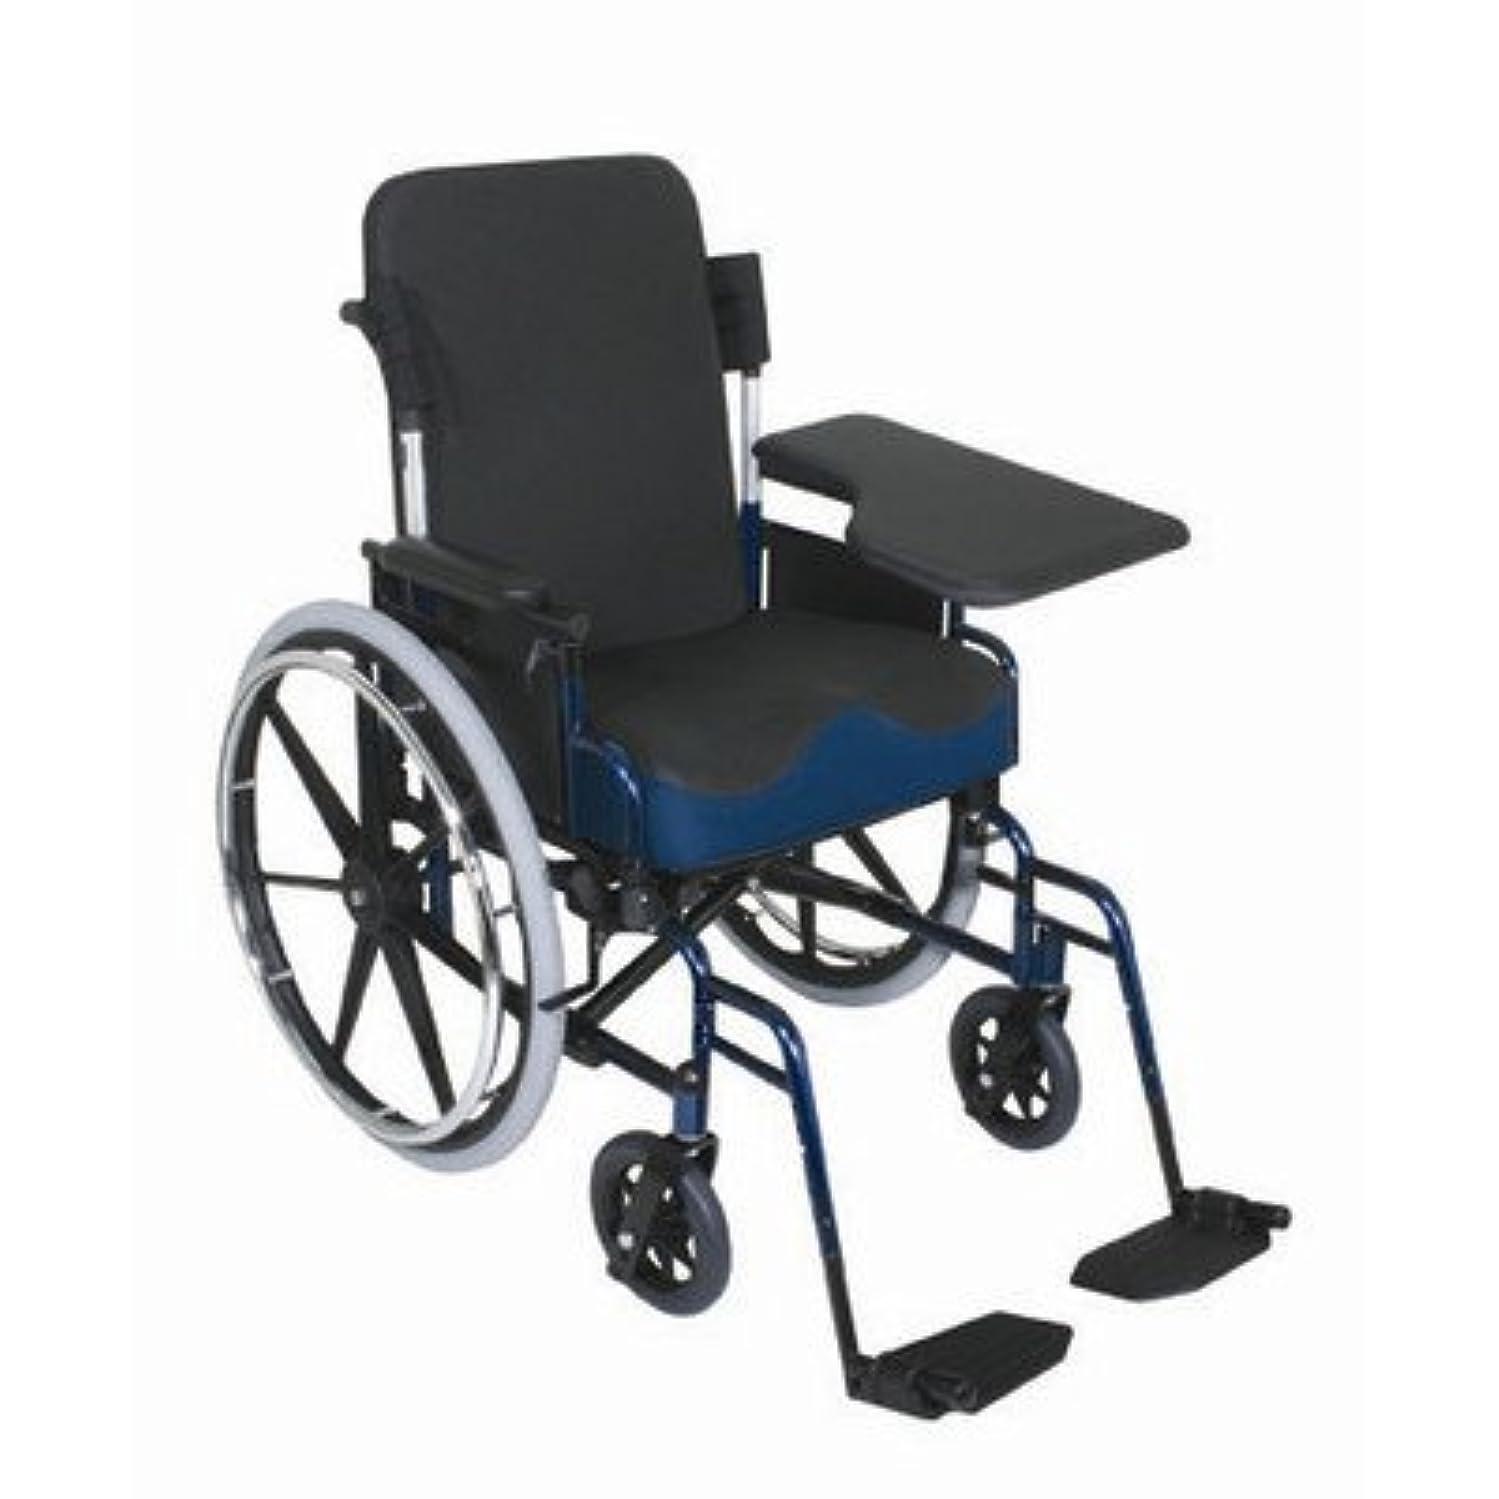 Flip-Up Half Wheelchair Lap Tray Type: Slide On, Side: Left